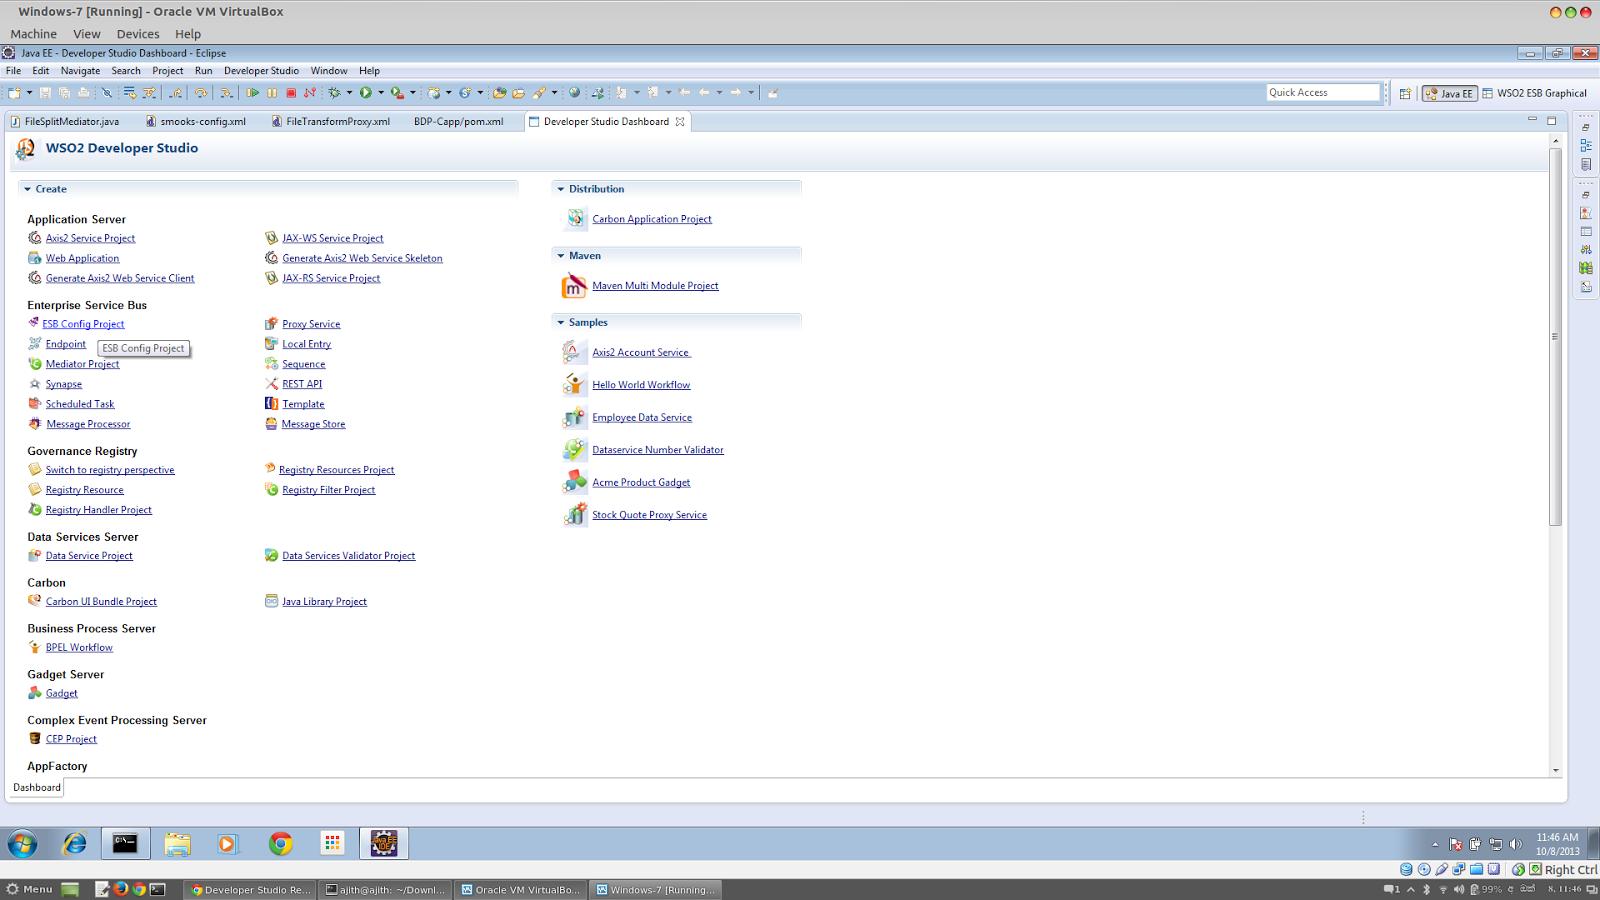 Ajith Vitharana's blog: EDI to XML using WSO2 ESB - Smooks